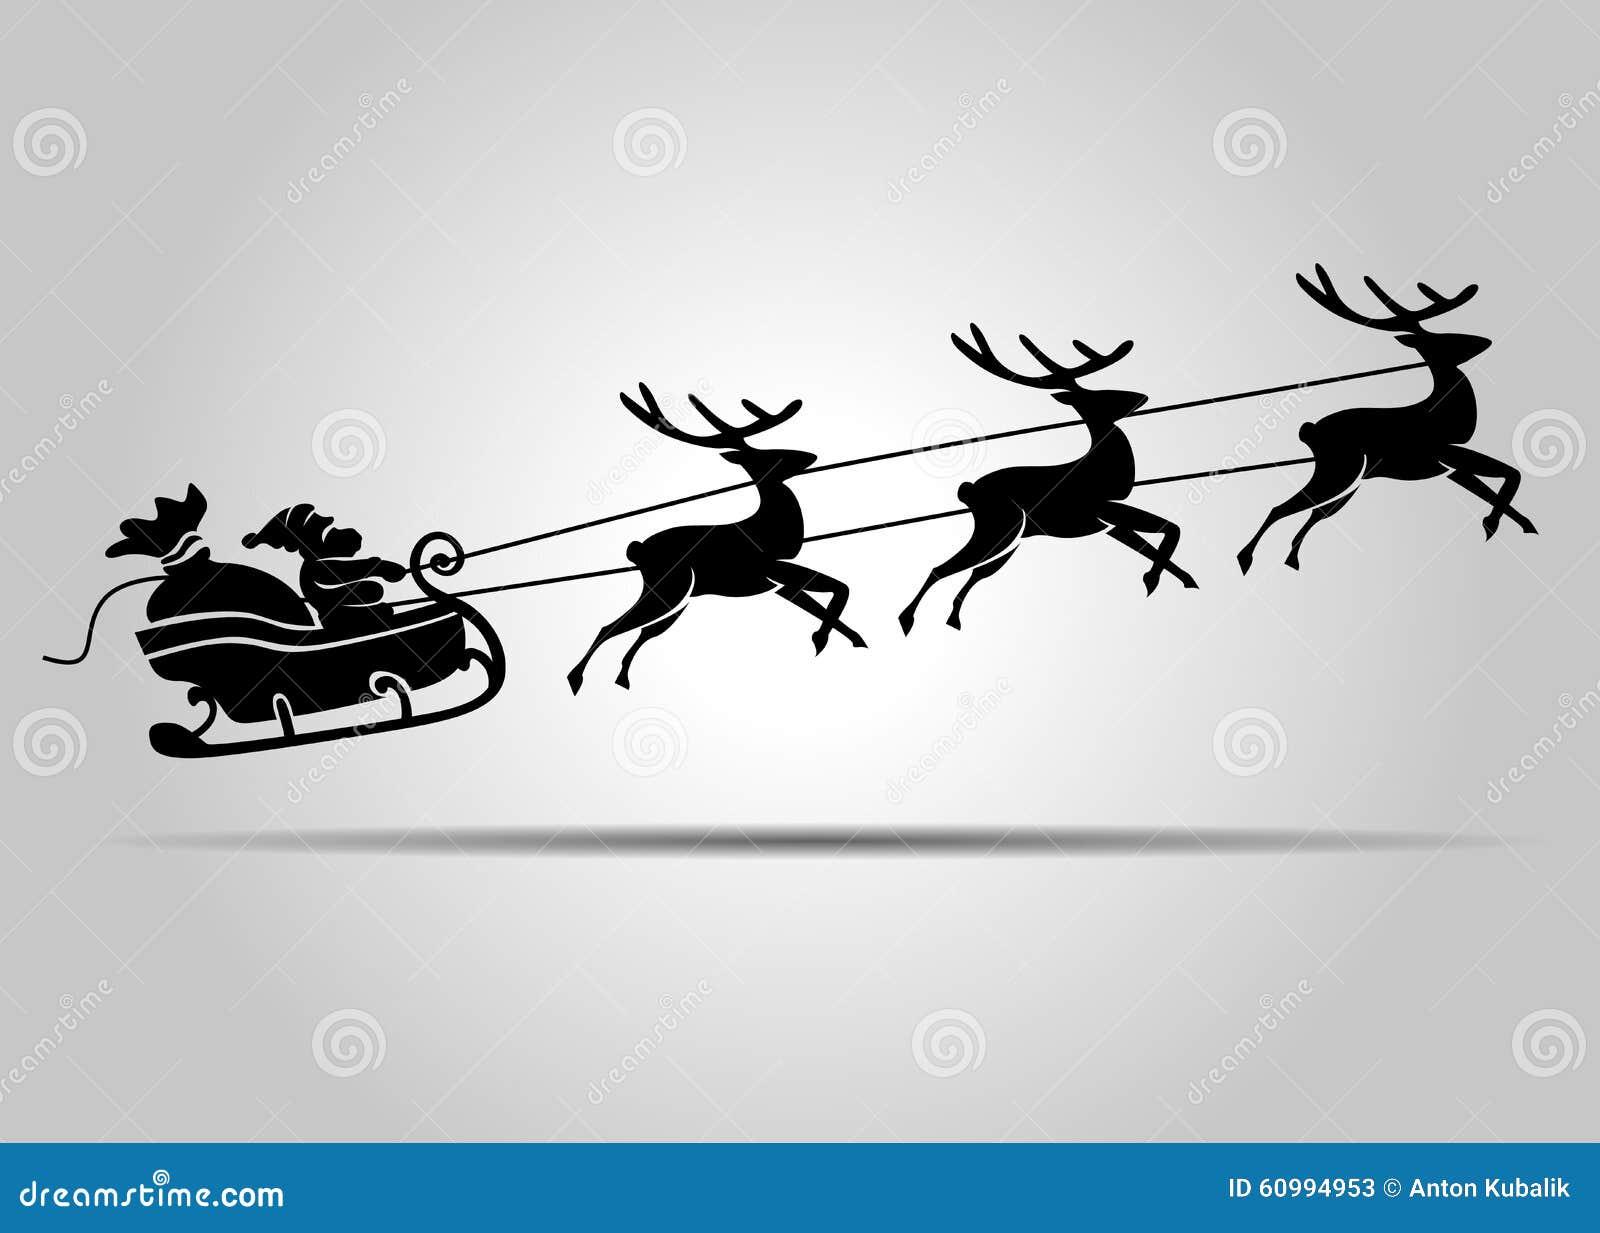 Santa Claus On Christmas Sleigh Stock Vector - Image: 60994953